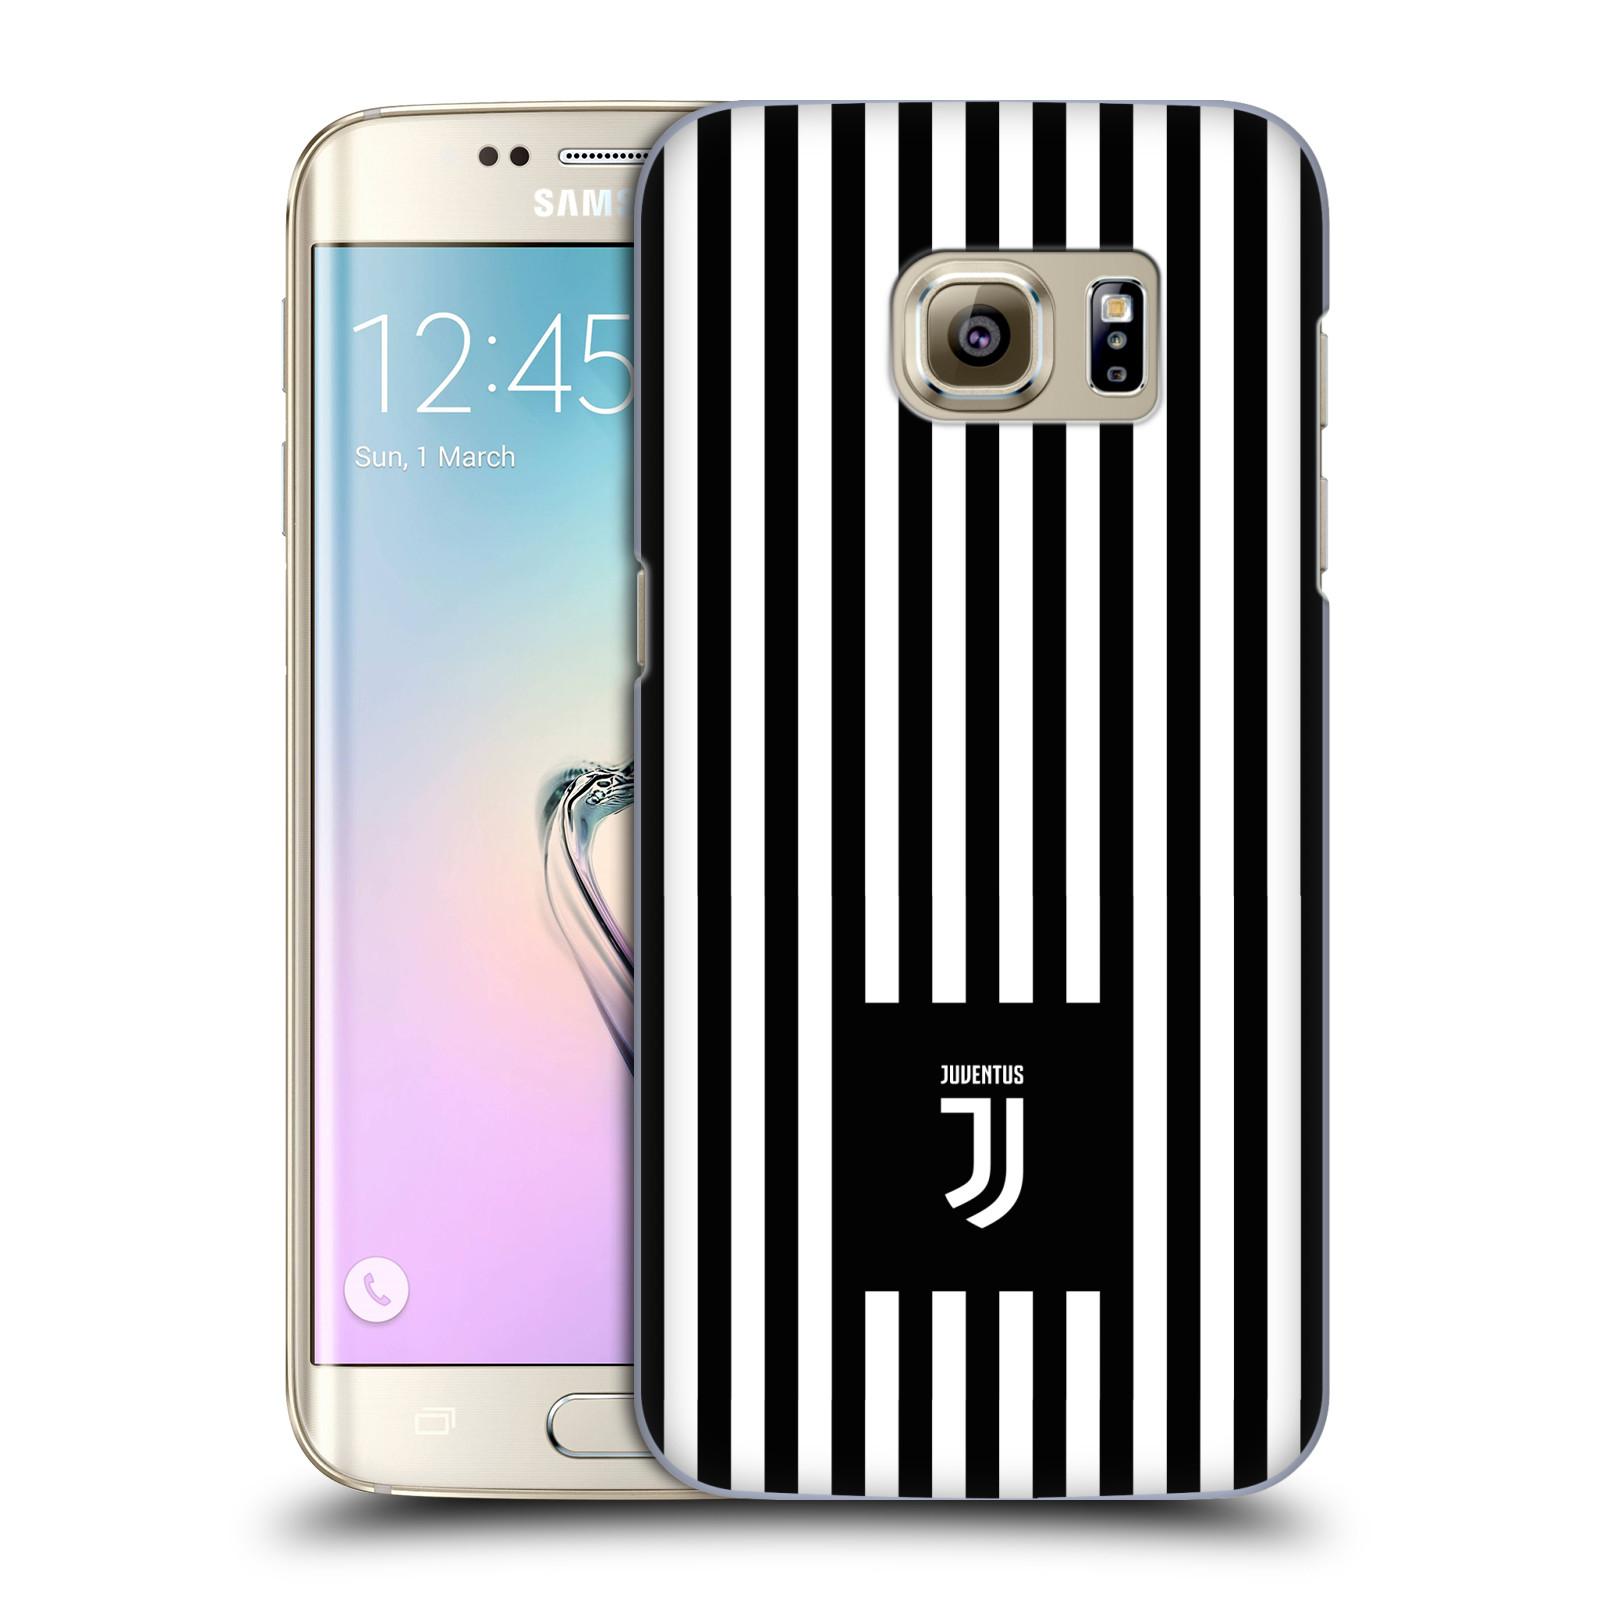 Plastové pouzdro na mobil Samsung Galaxy S7 Edge - Head Case - Juventus FC - Nové logo - Pruhy